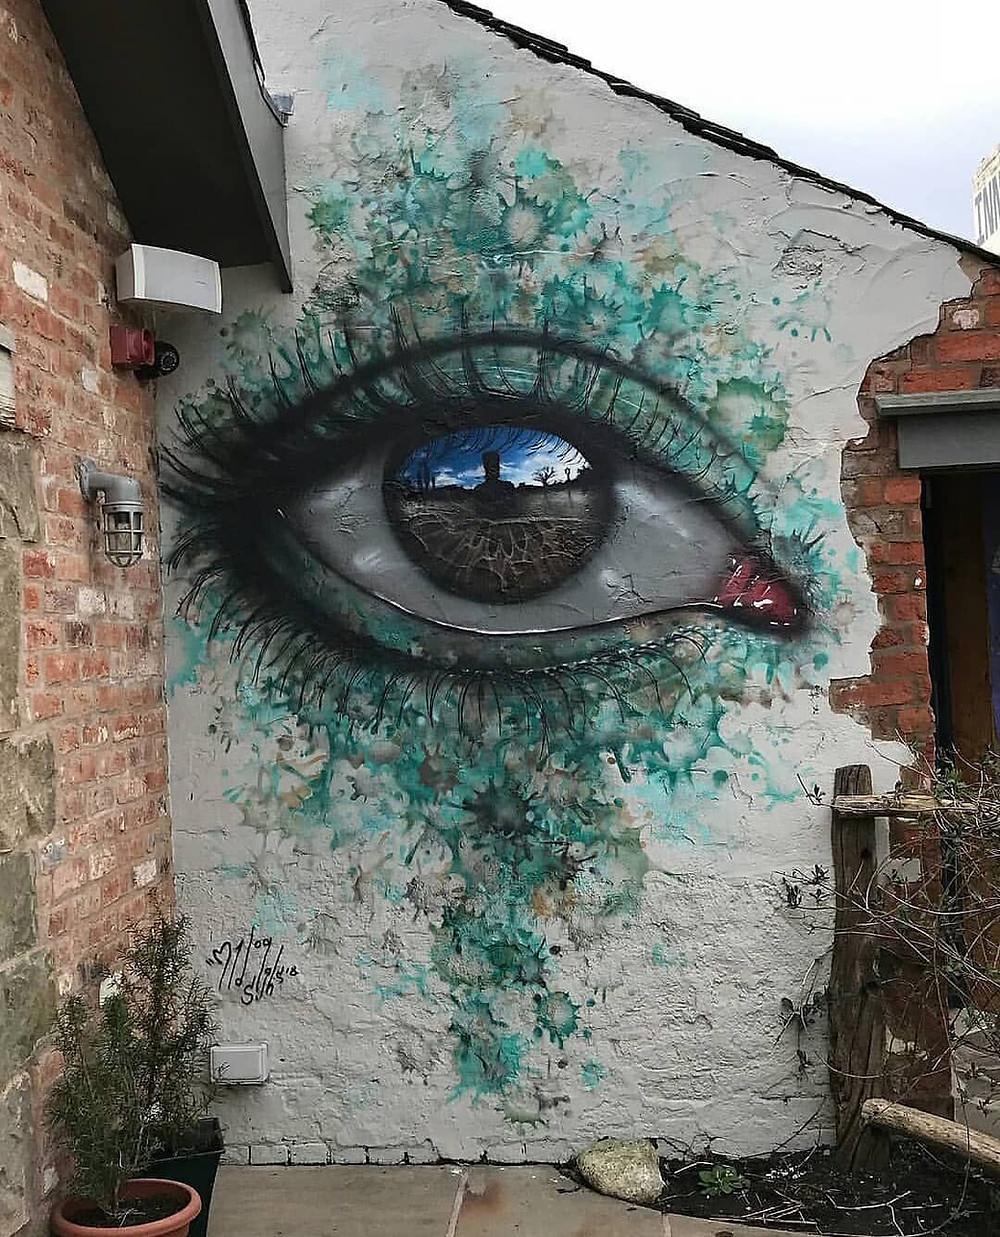 Commission for @cartfordinn in little Eccleston, Lancashire